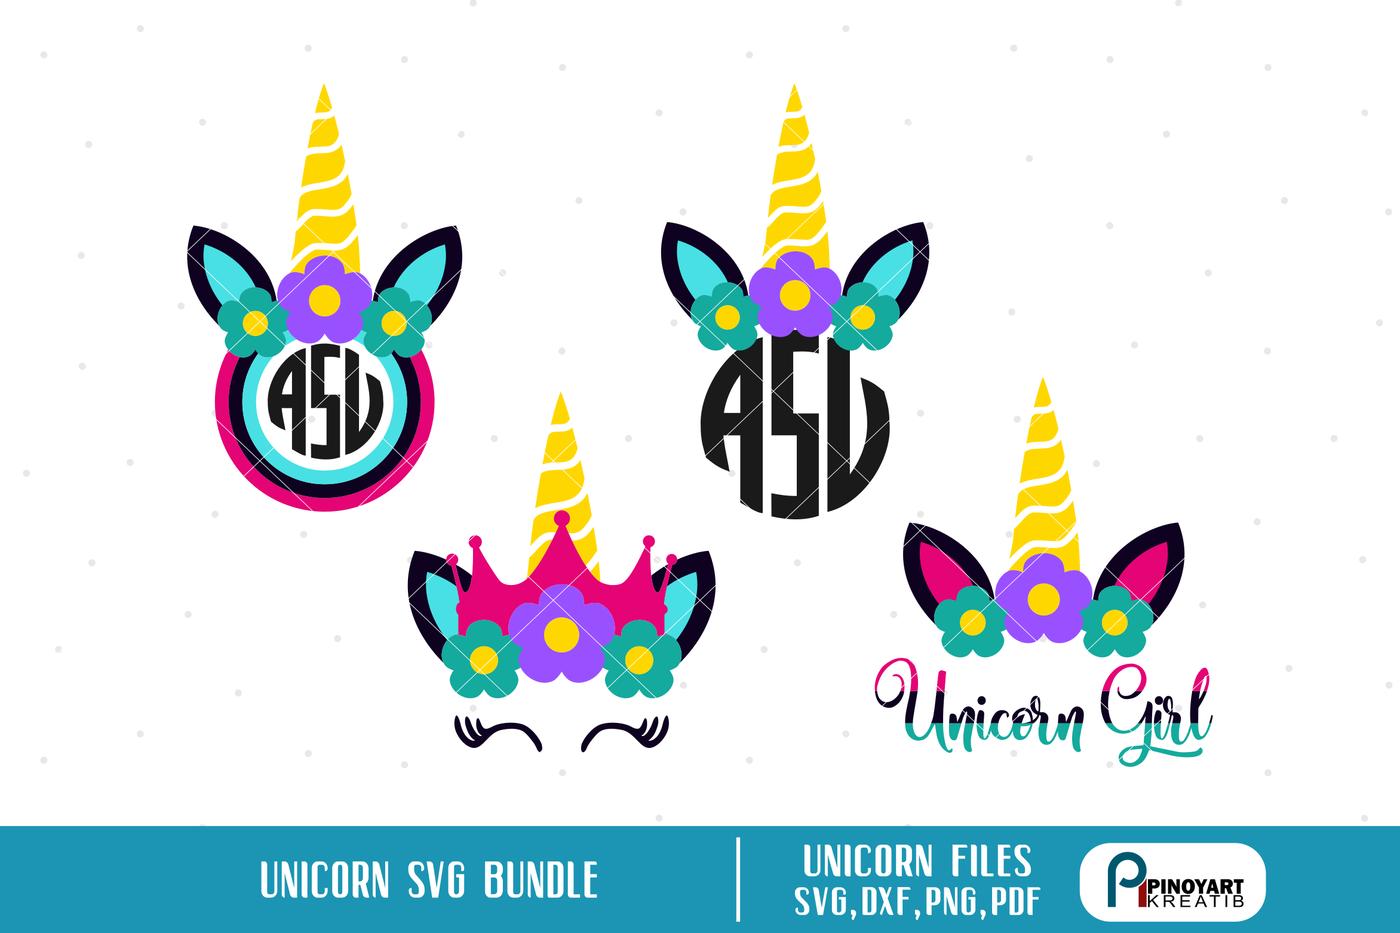 Unicorn Svg Unicorn Svg File Unicorn Graphics Unicorn Clip Art